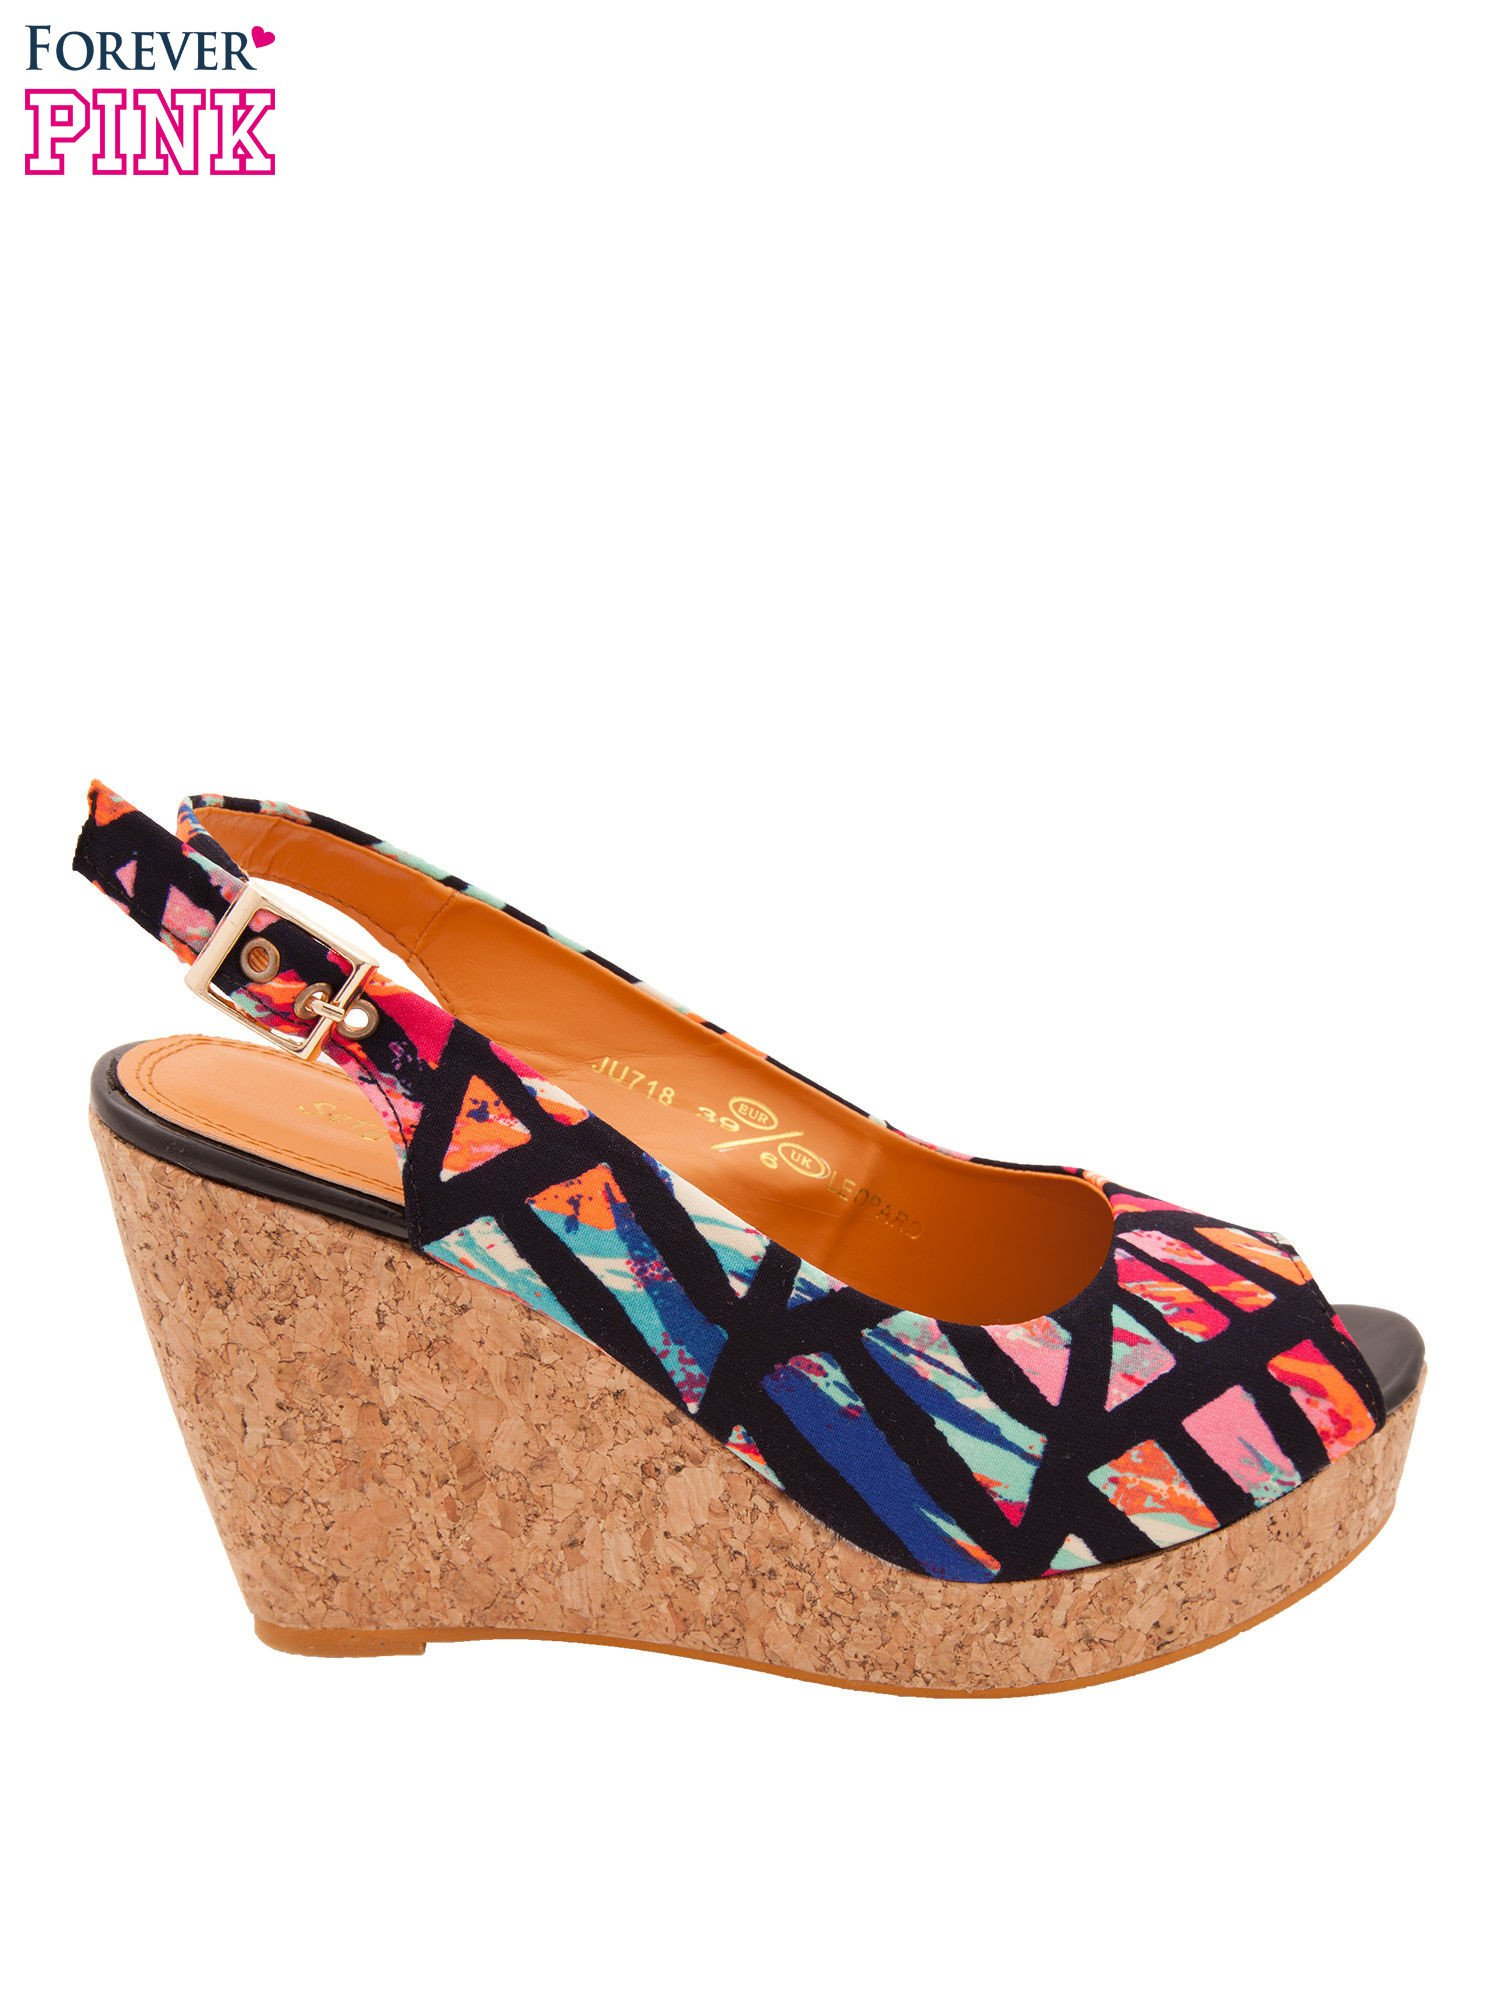 Multikolorowe sandały peep toe na koturnie korku                                  zdj.                                  1